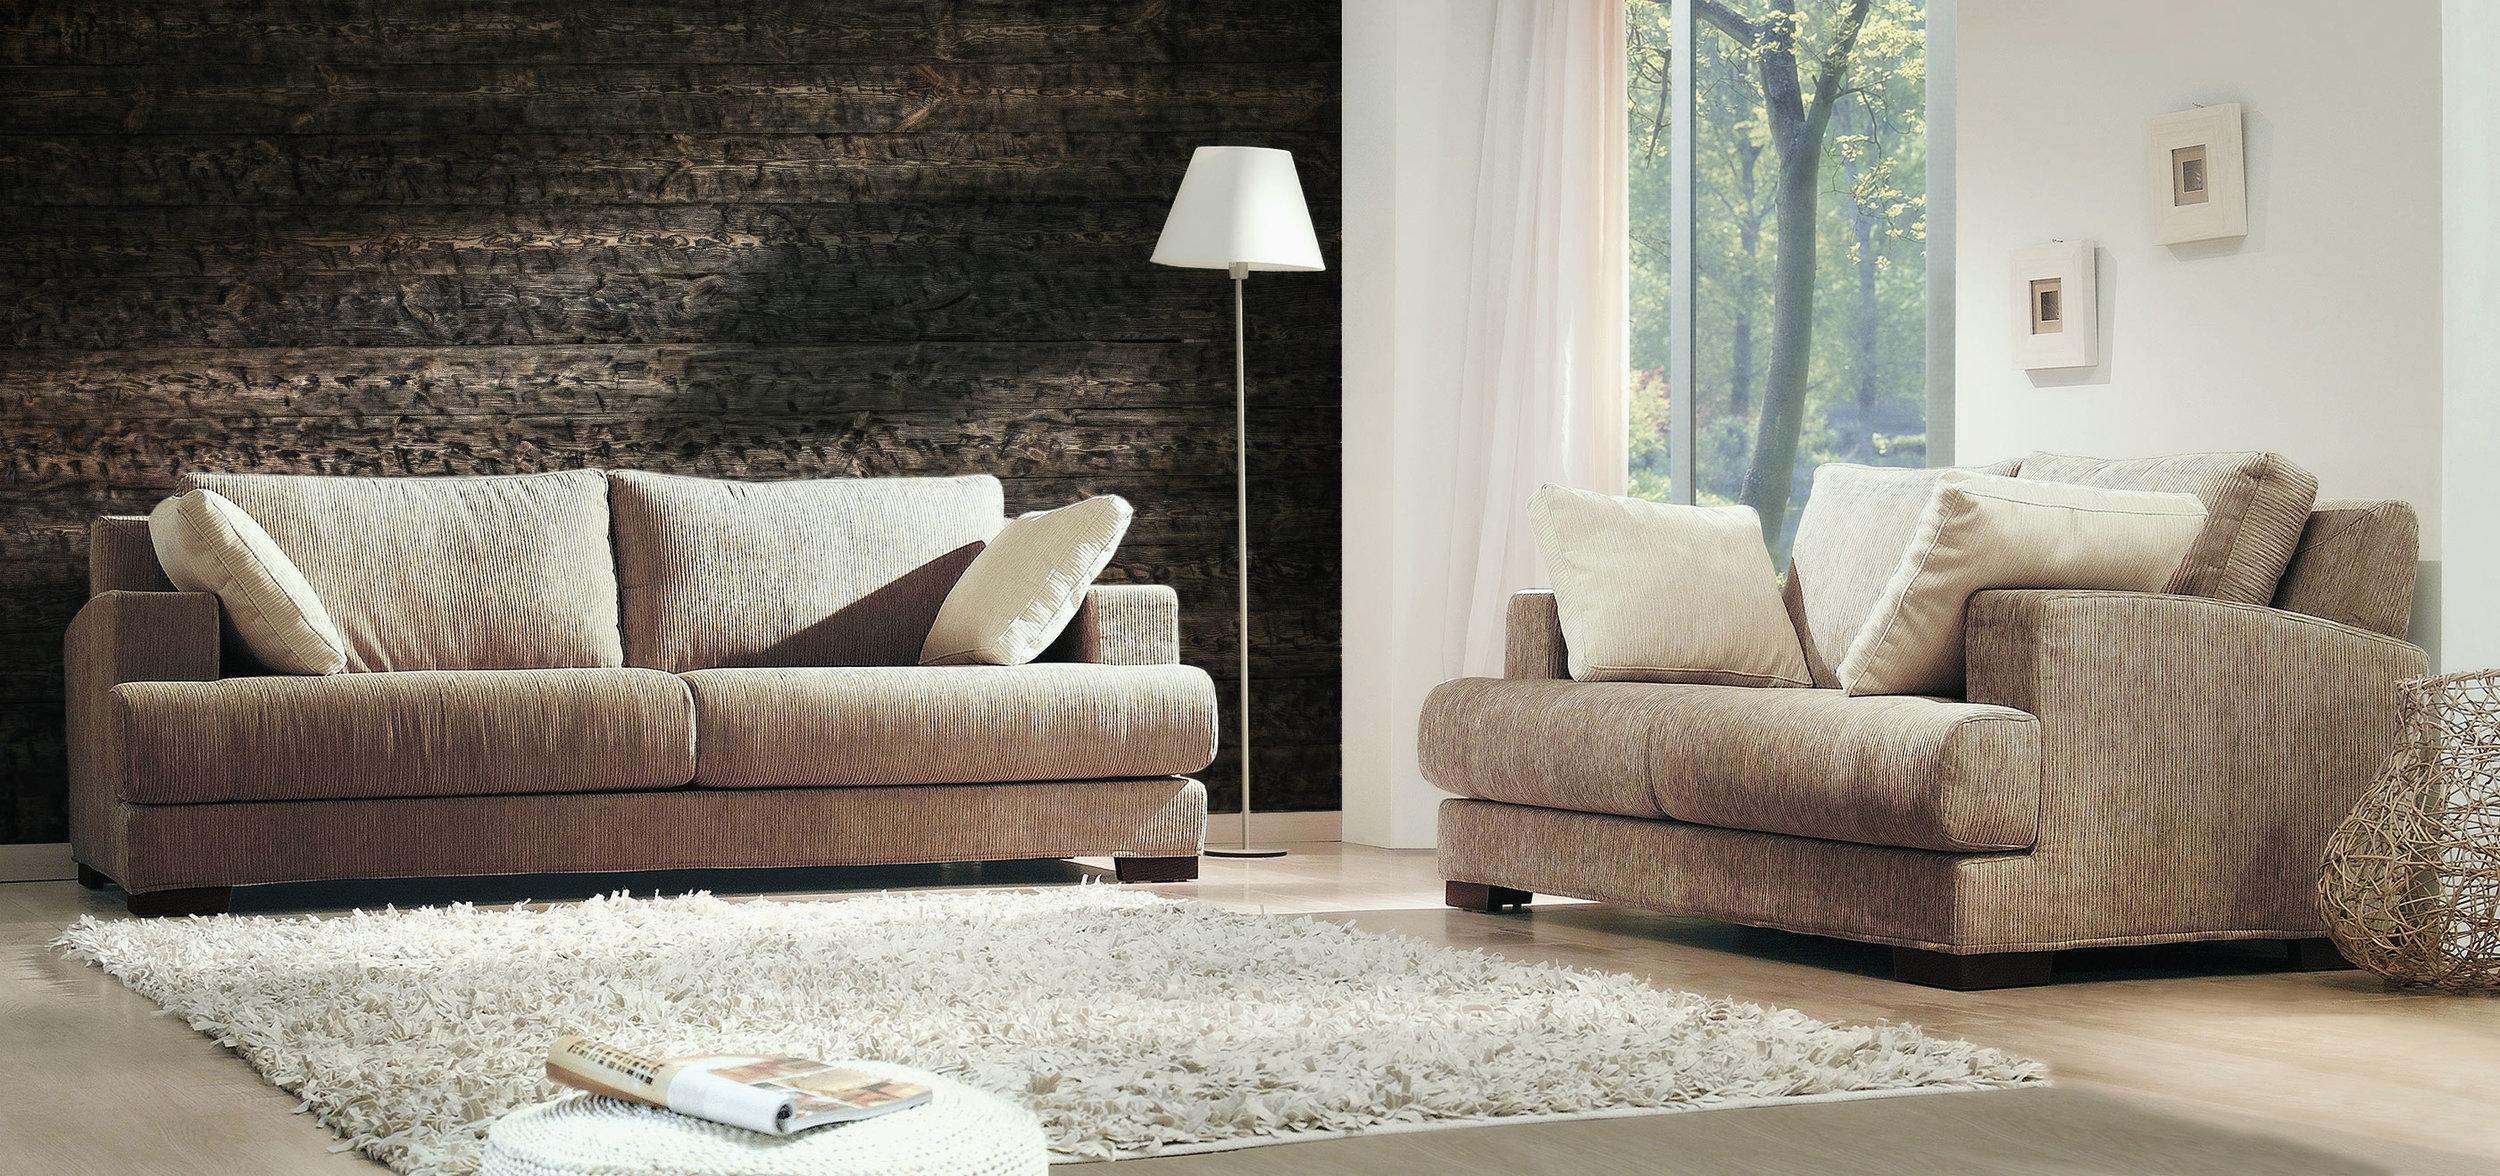 rwood-living-room-wooden-wall-5.jpg